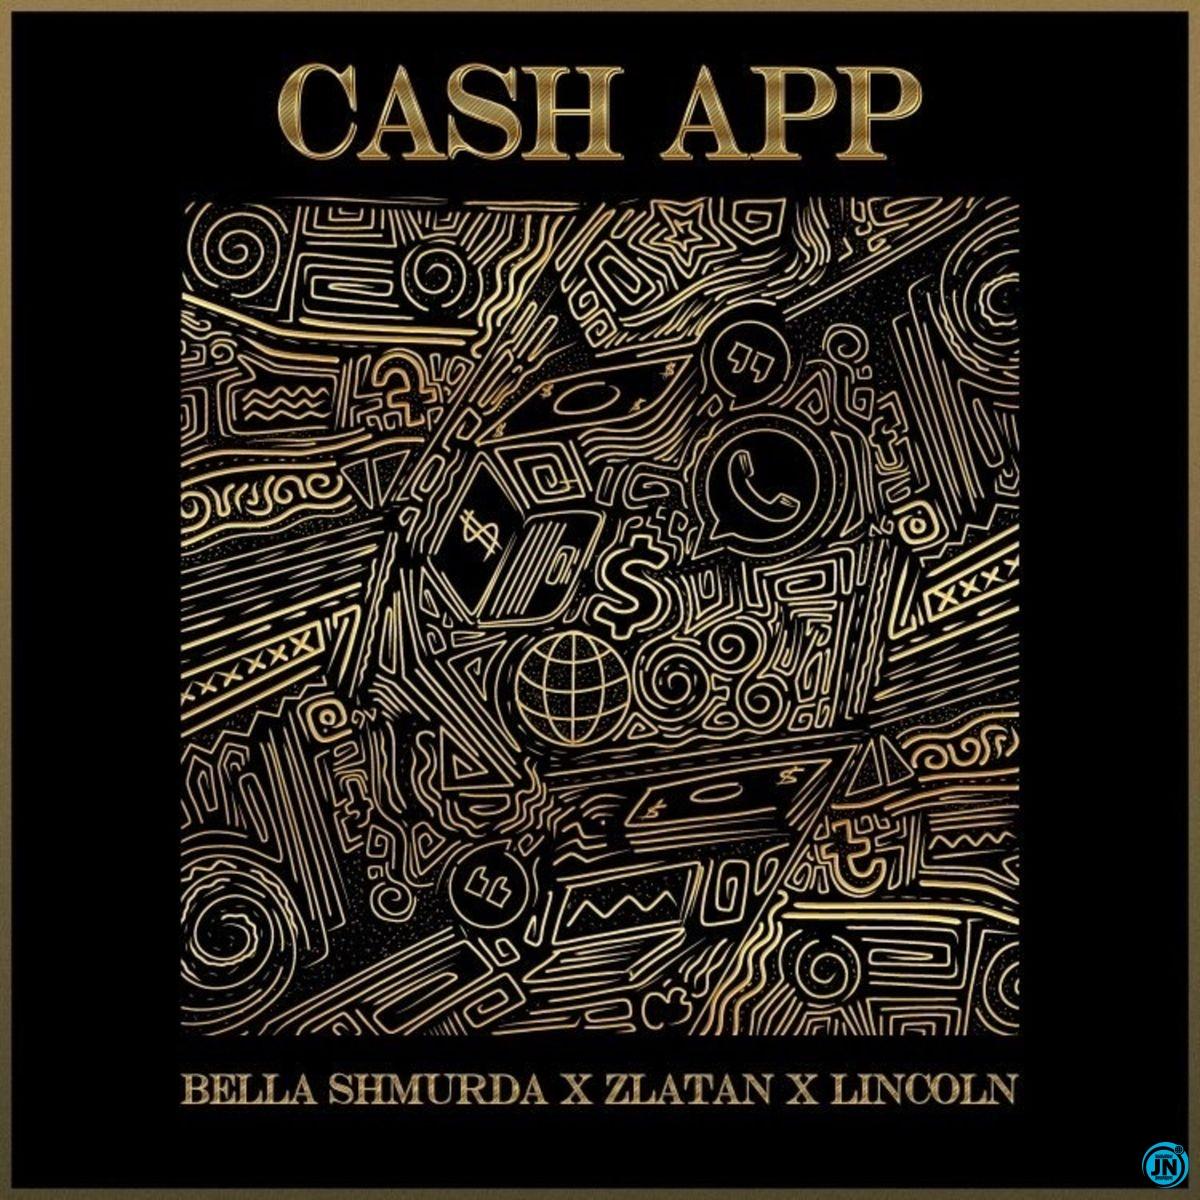 Bella Shmurda – Cash App ft. Zlatan & Lincon